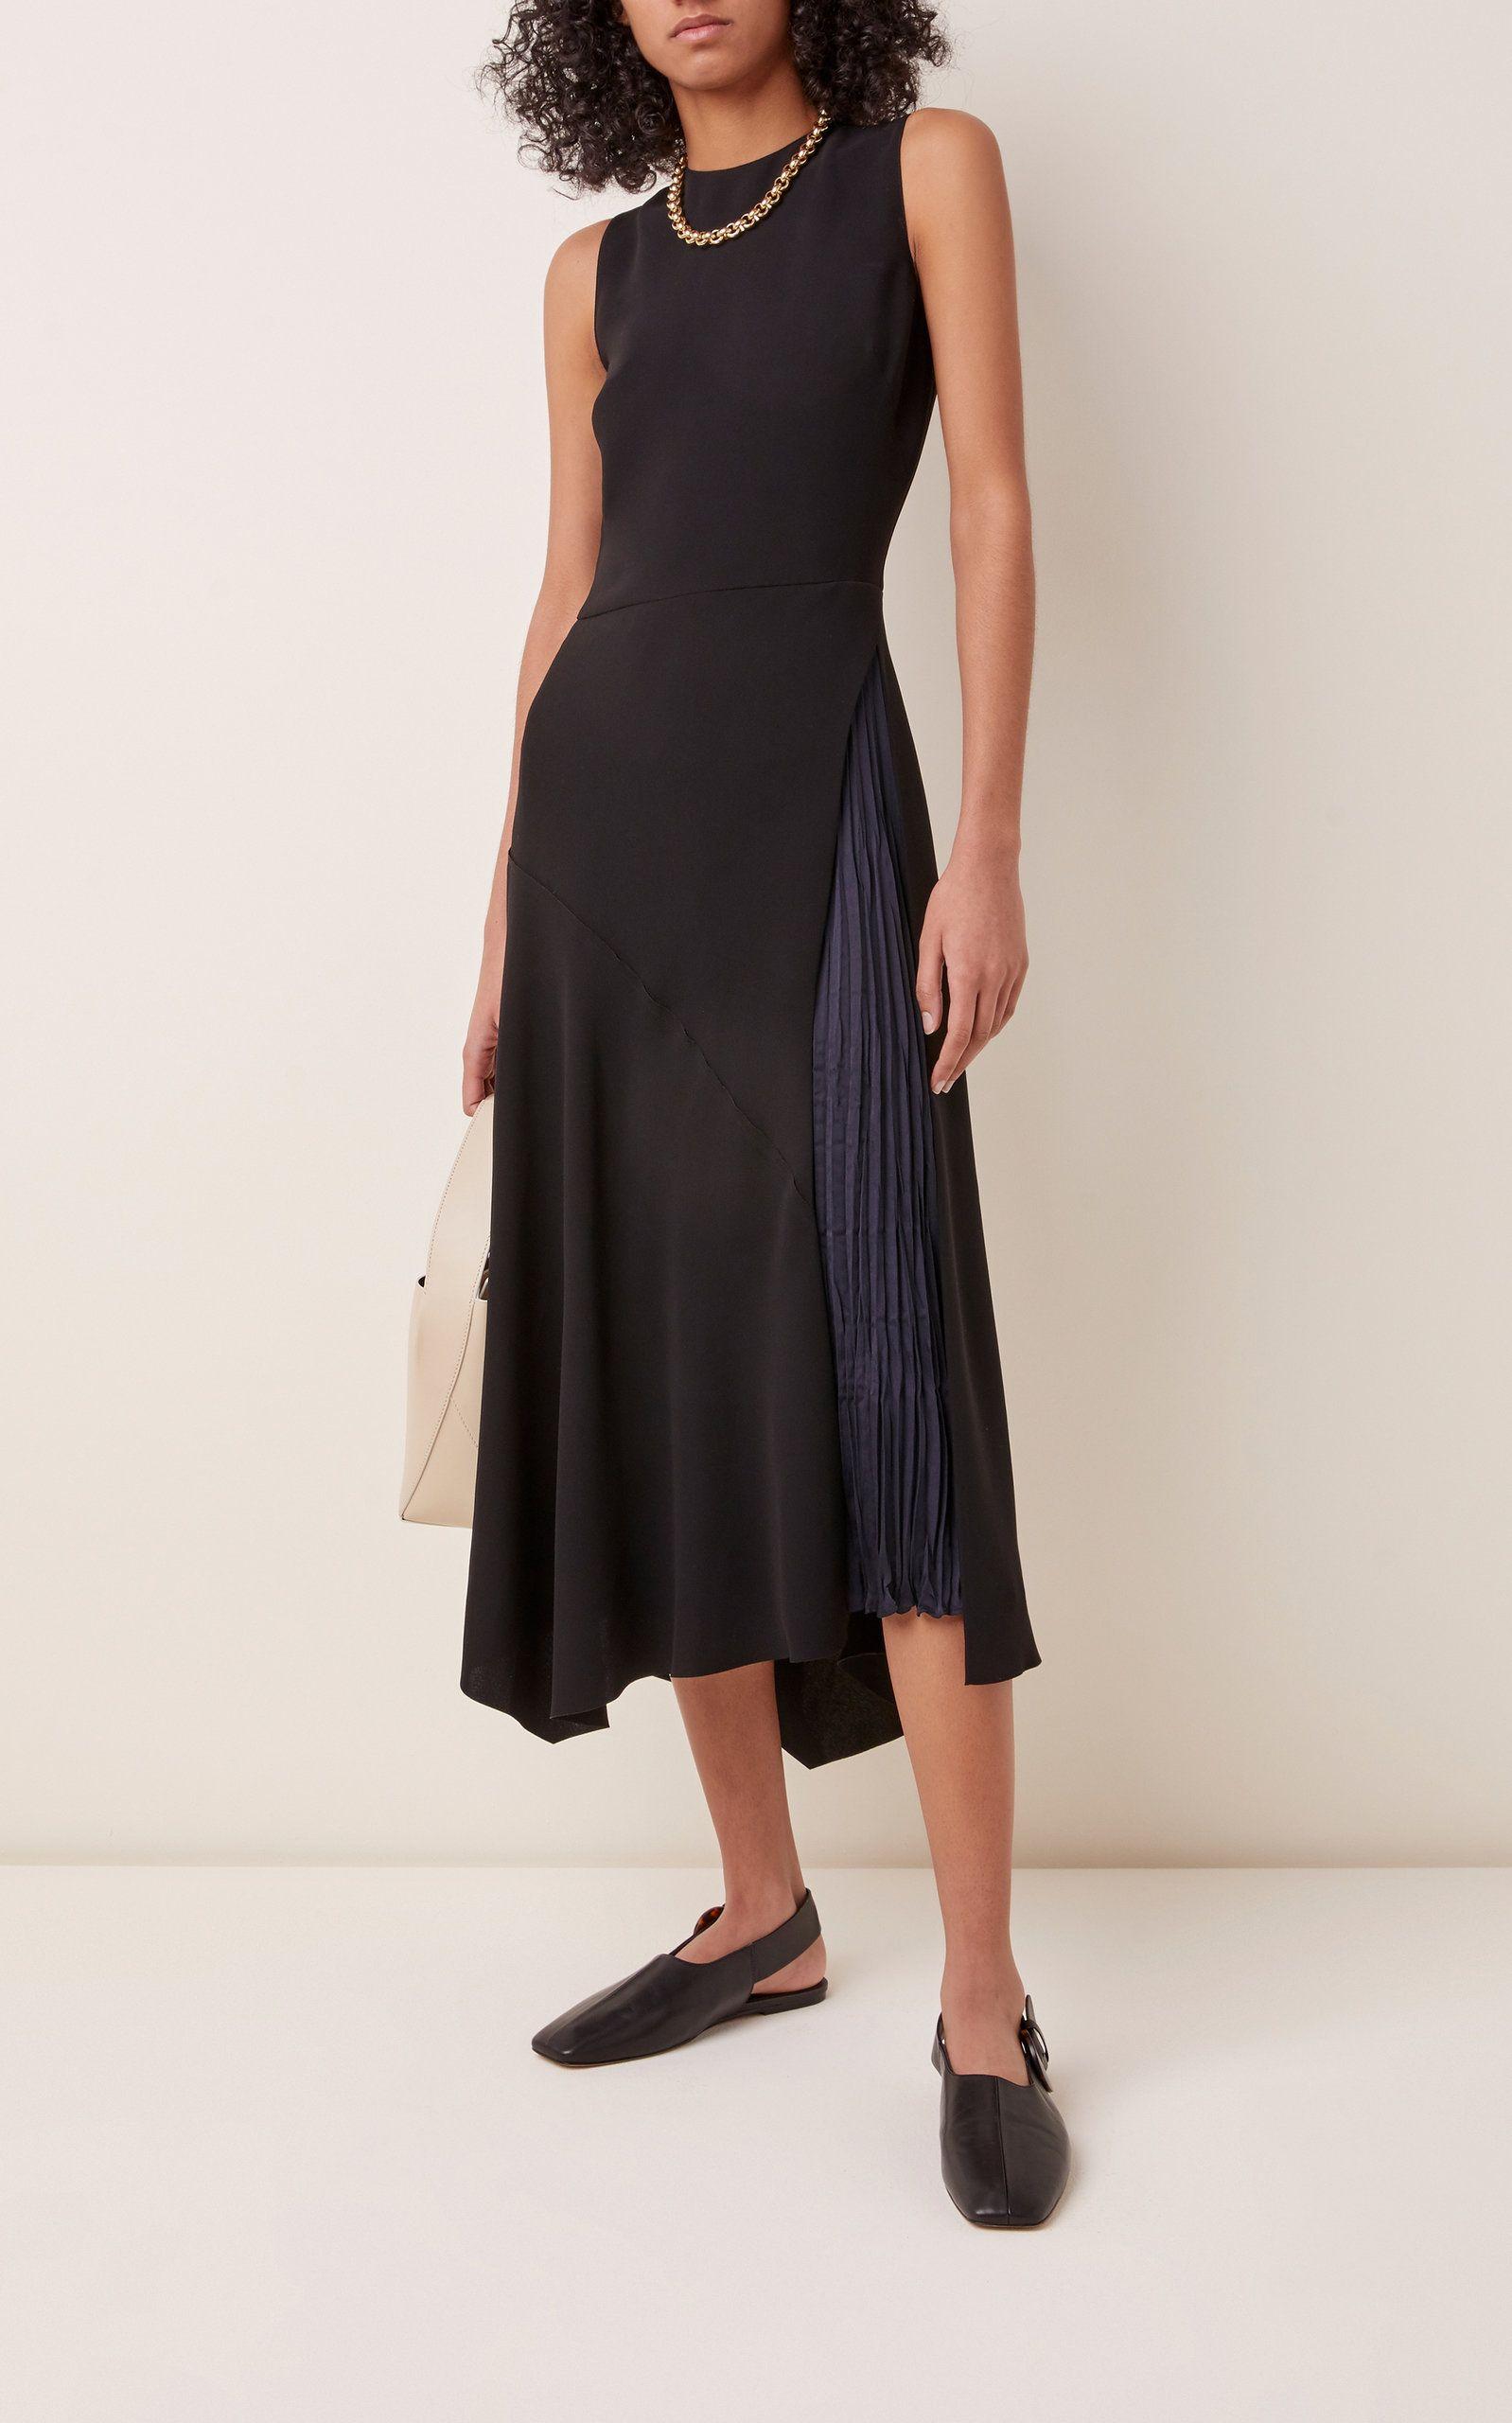 Vince Asymmetric Gauze Midi Dress Midi Dress Dresses Black Midi Dress [ 2560 x 1598 Pixel ]